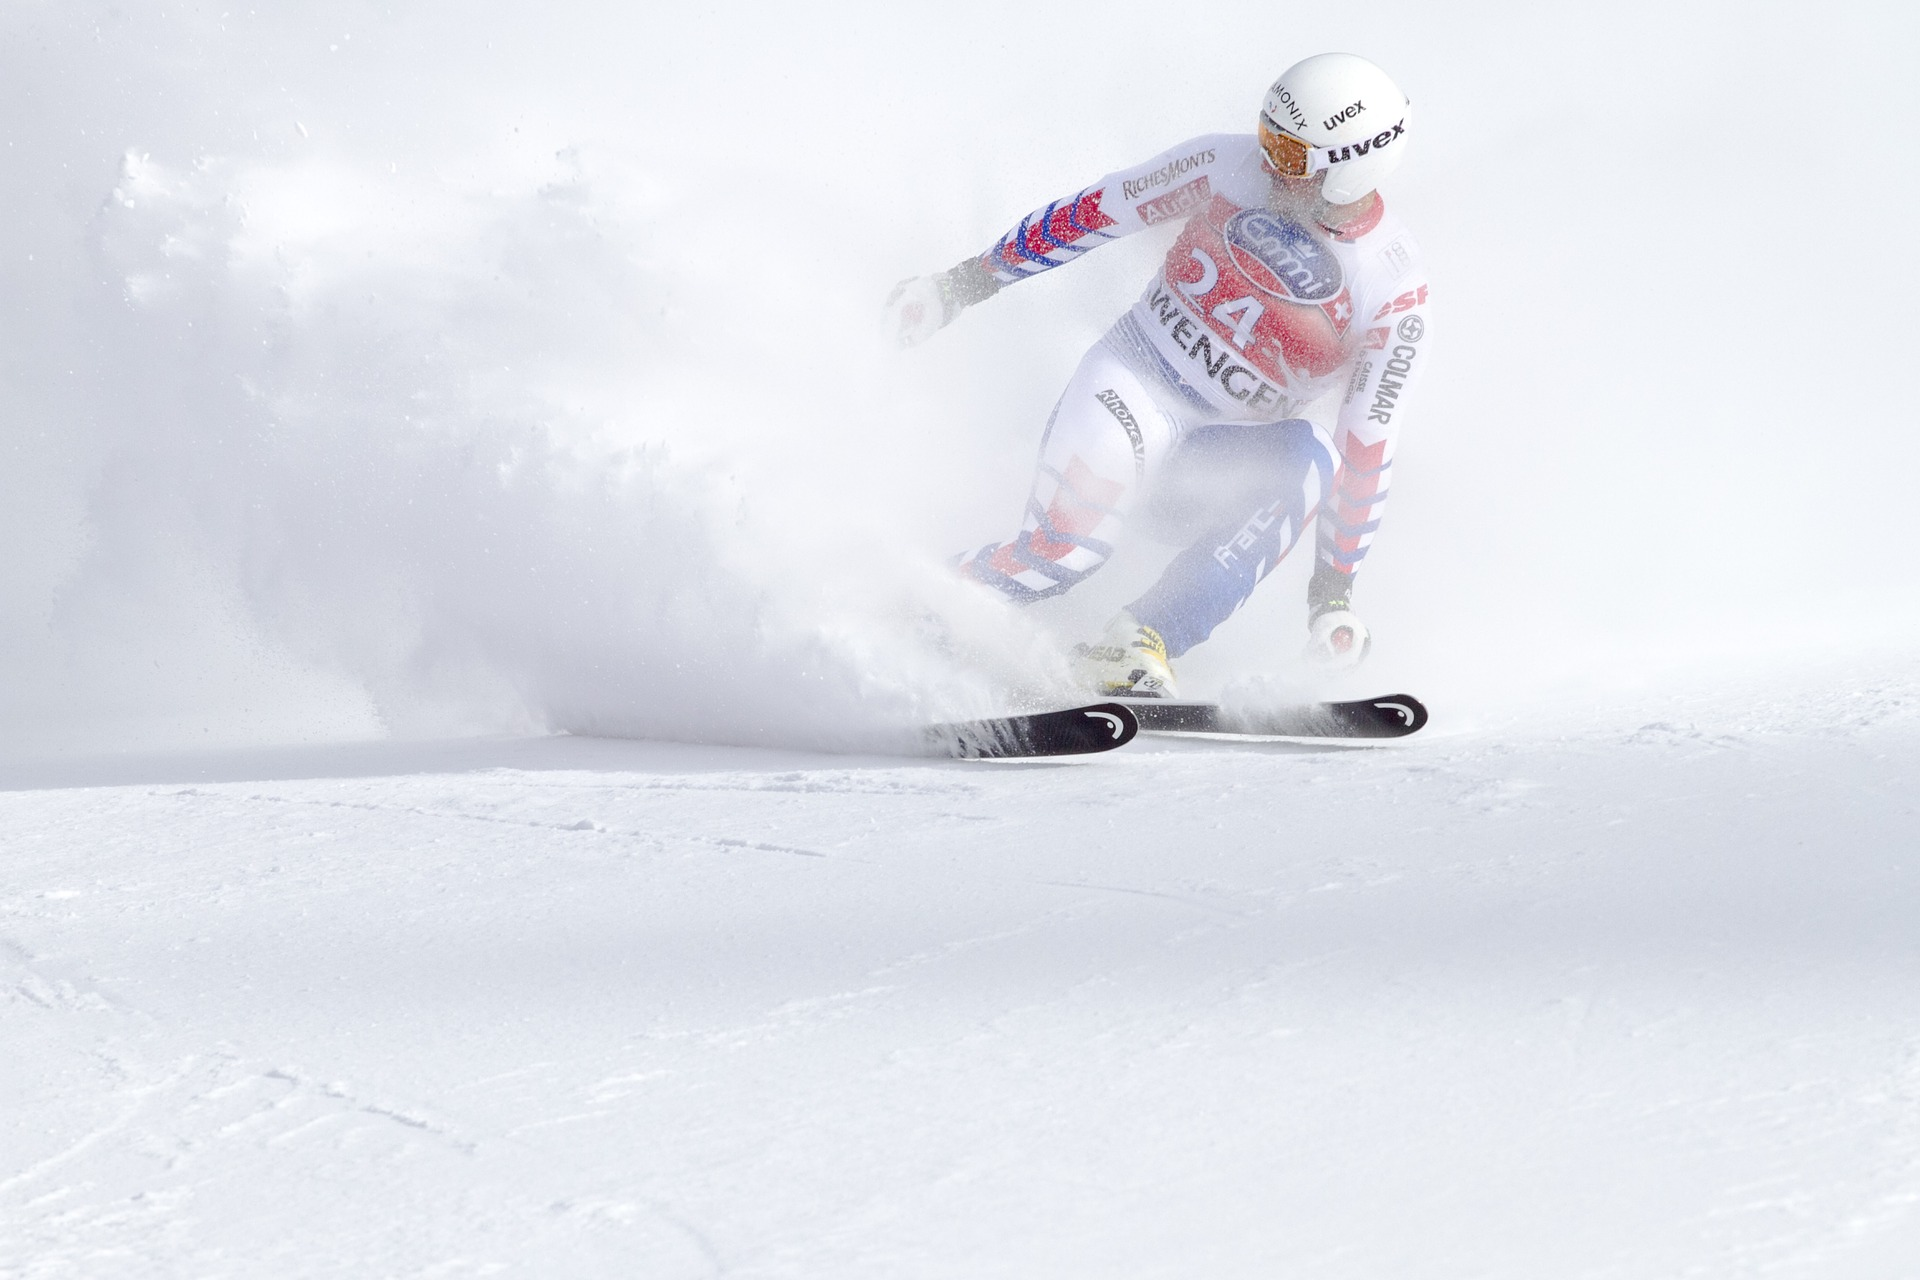 ski-race-2246889_1920.jpg